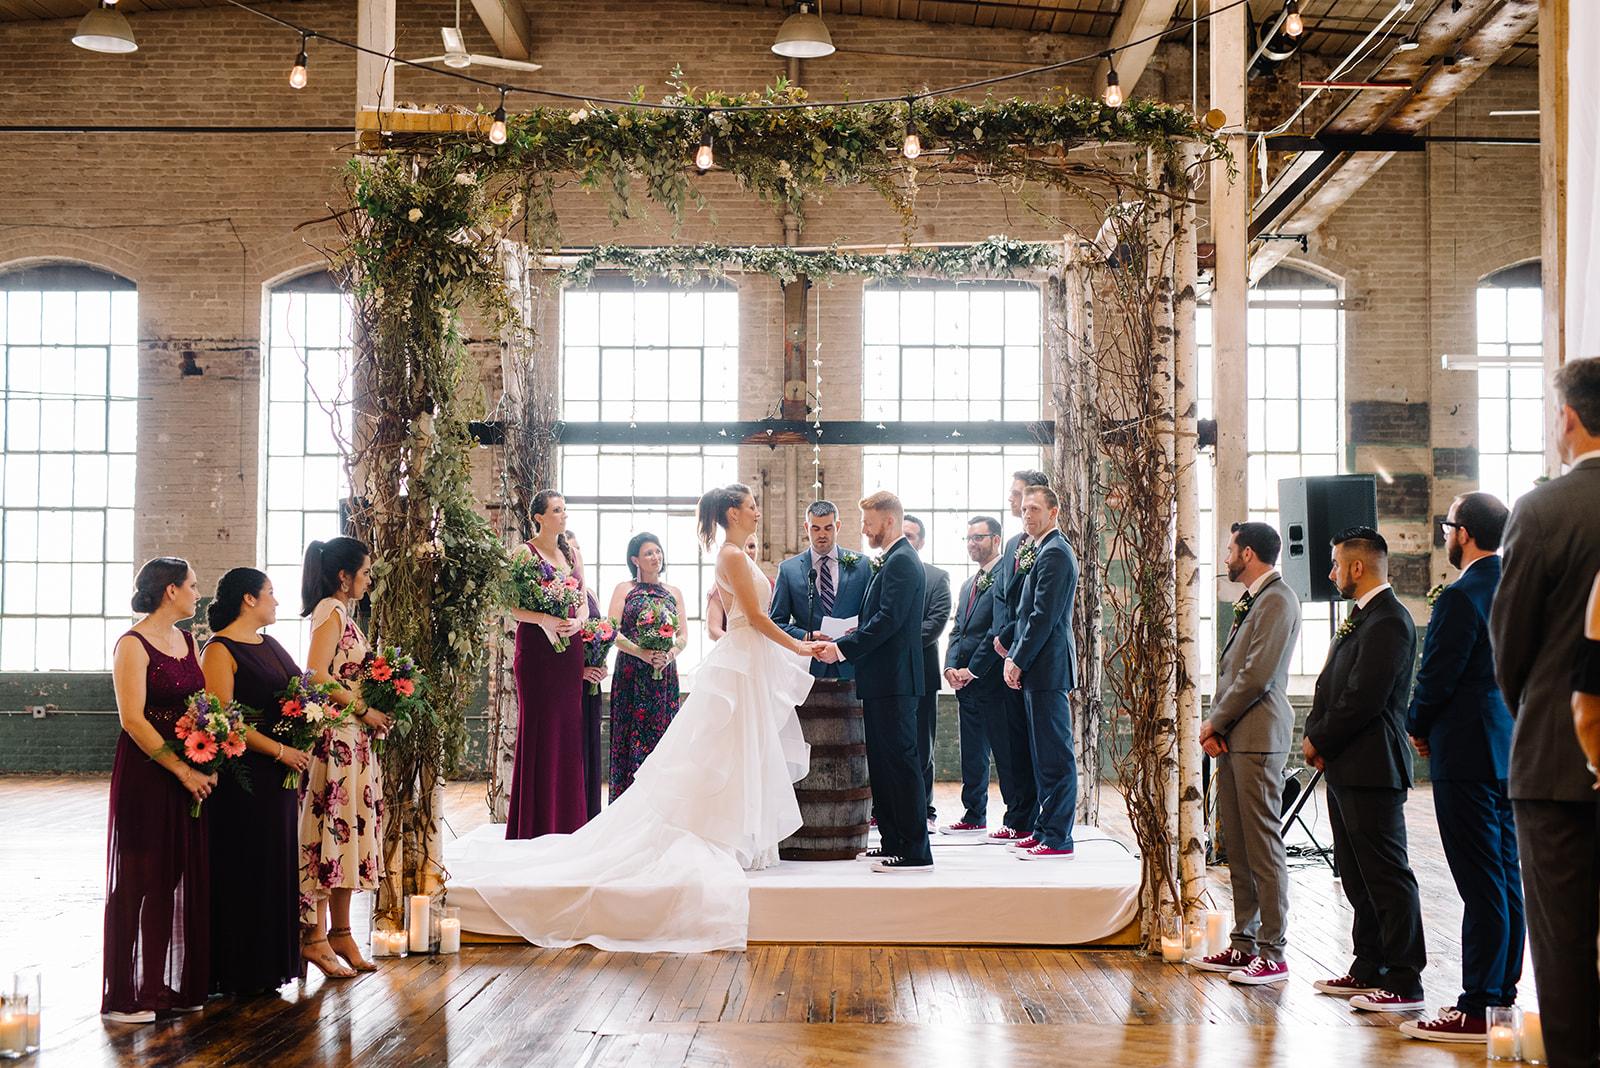 Art Factory Wedding- Industrial Chic- Audrey+Ryan- Paterson NJ- Olivia Christina Photo (35).jpg